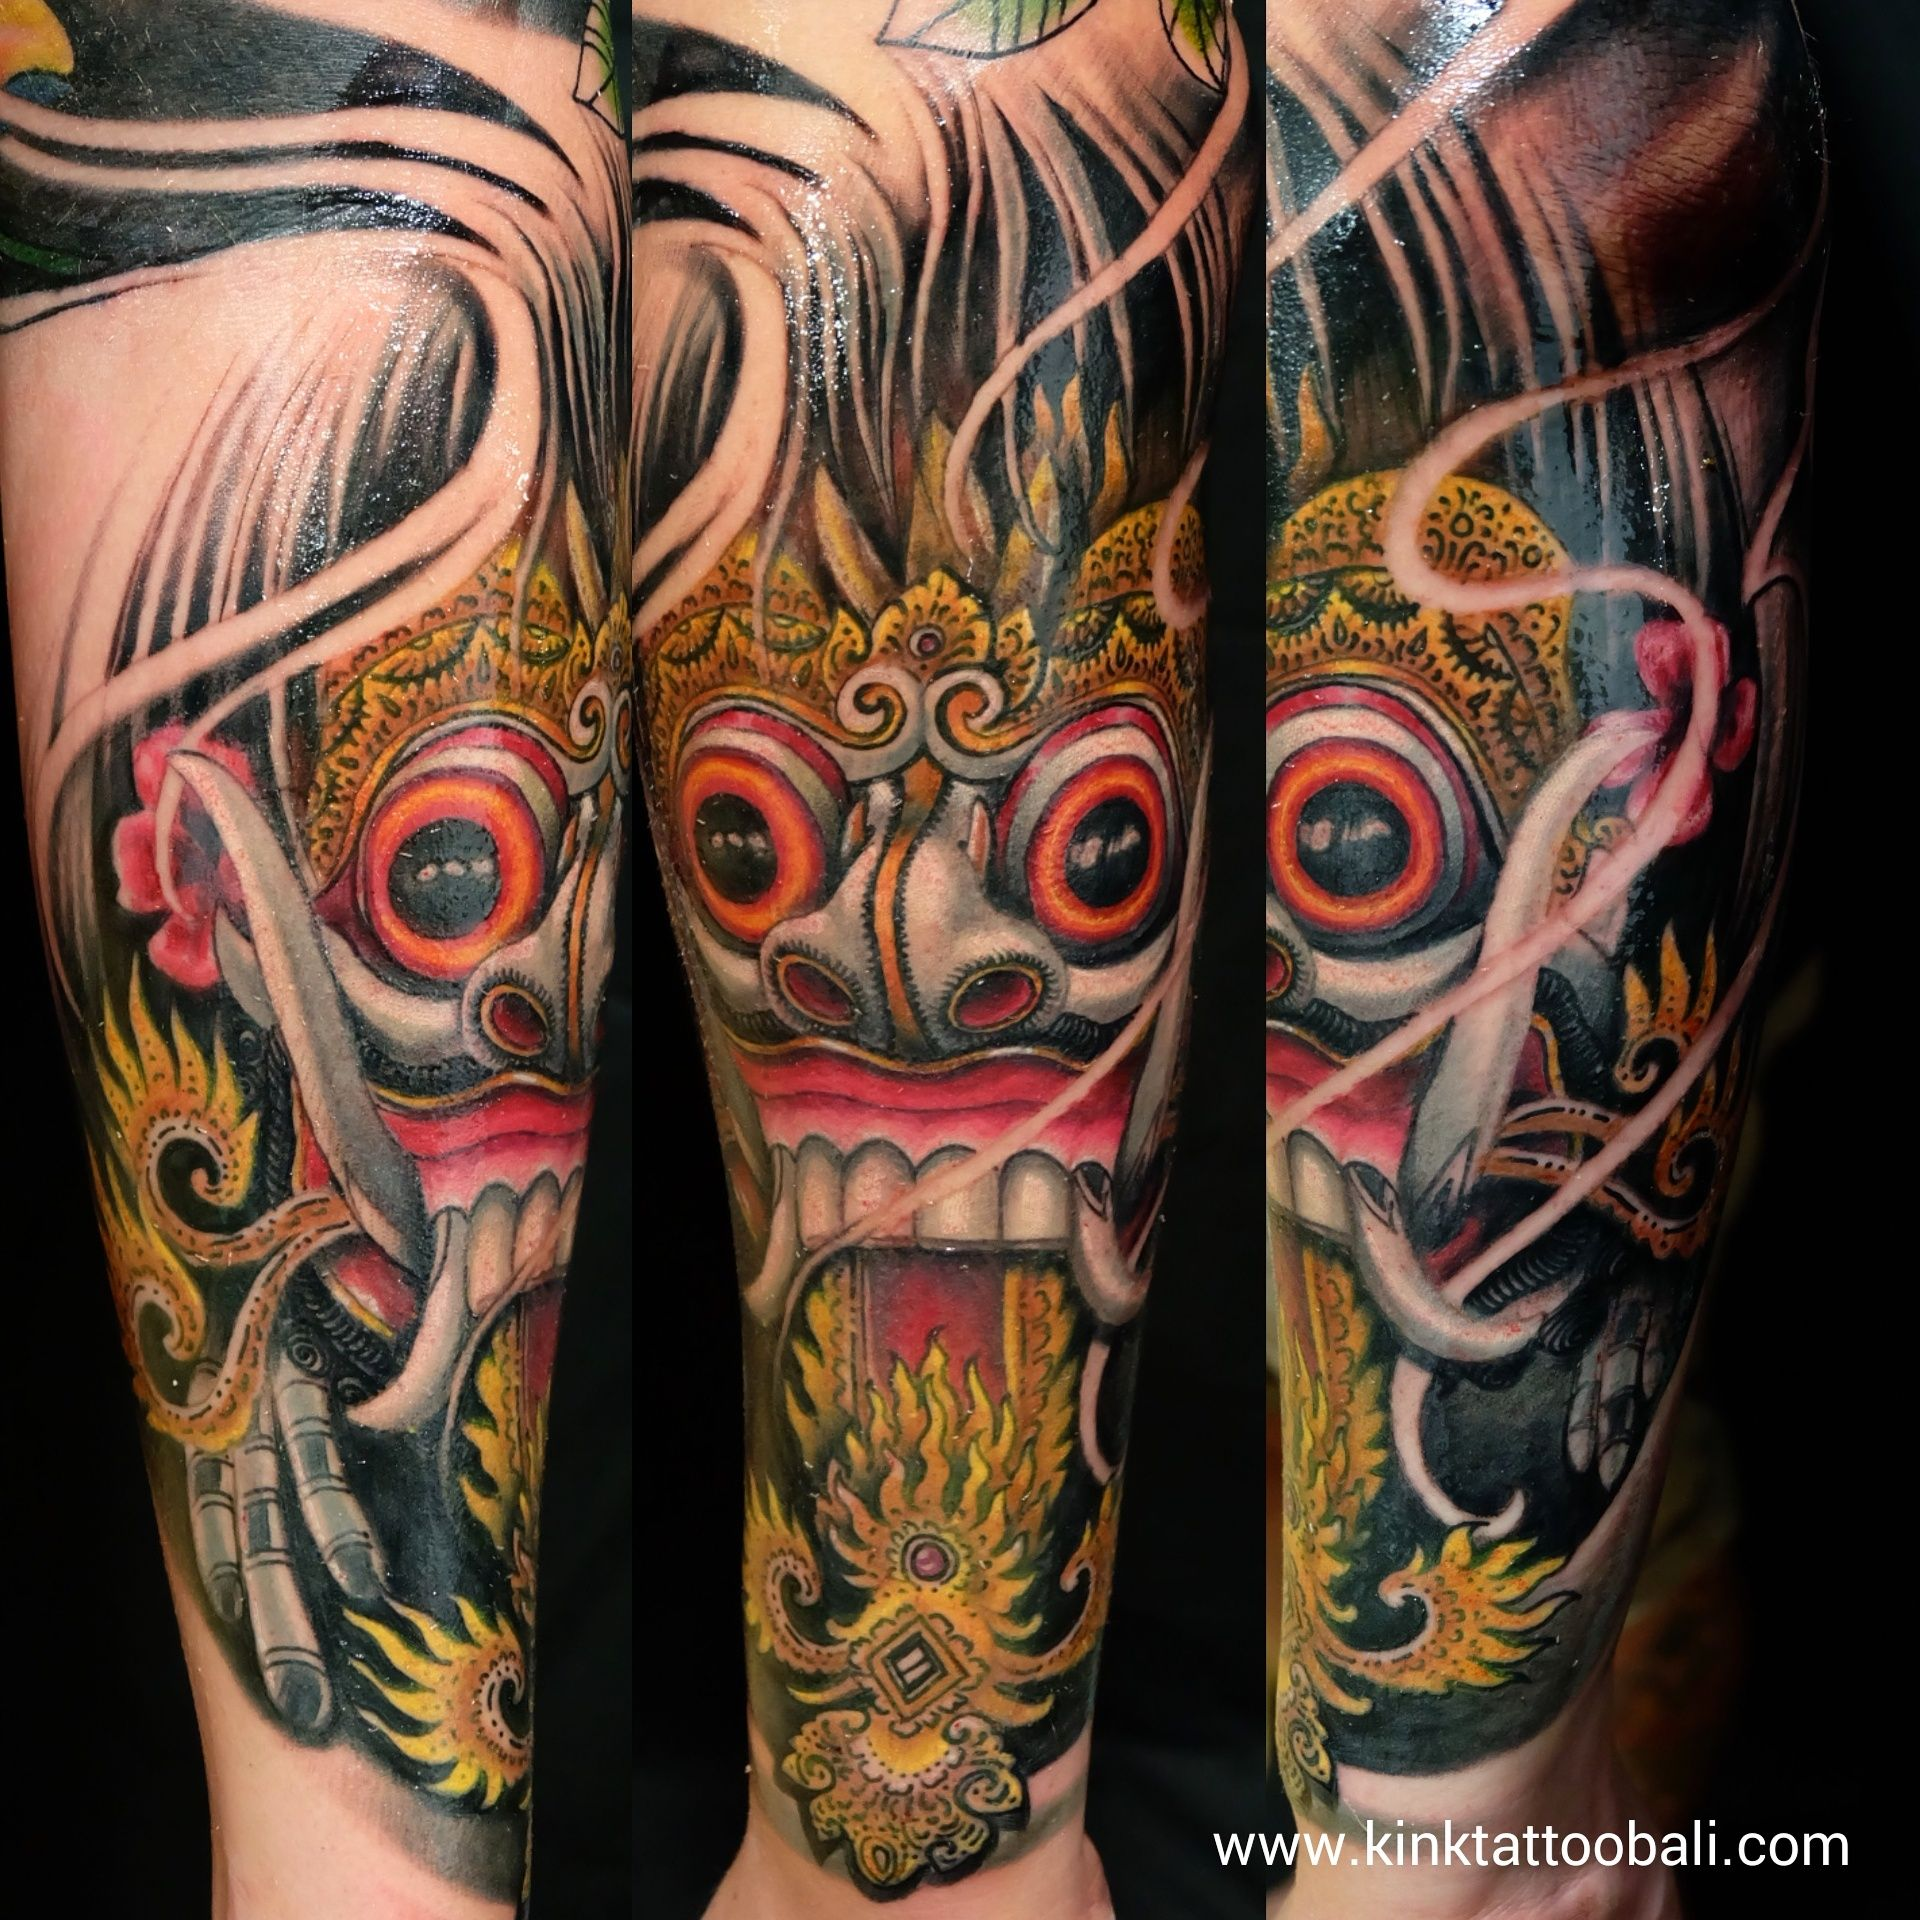 Pin Di Color Tattoo Kink Tattoo Bali